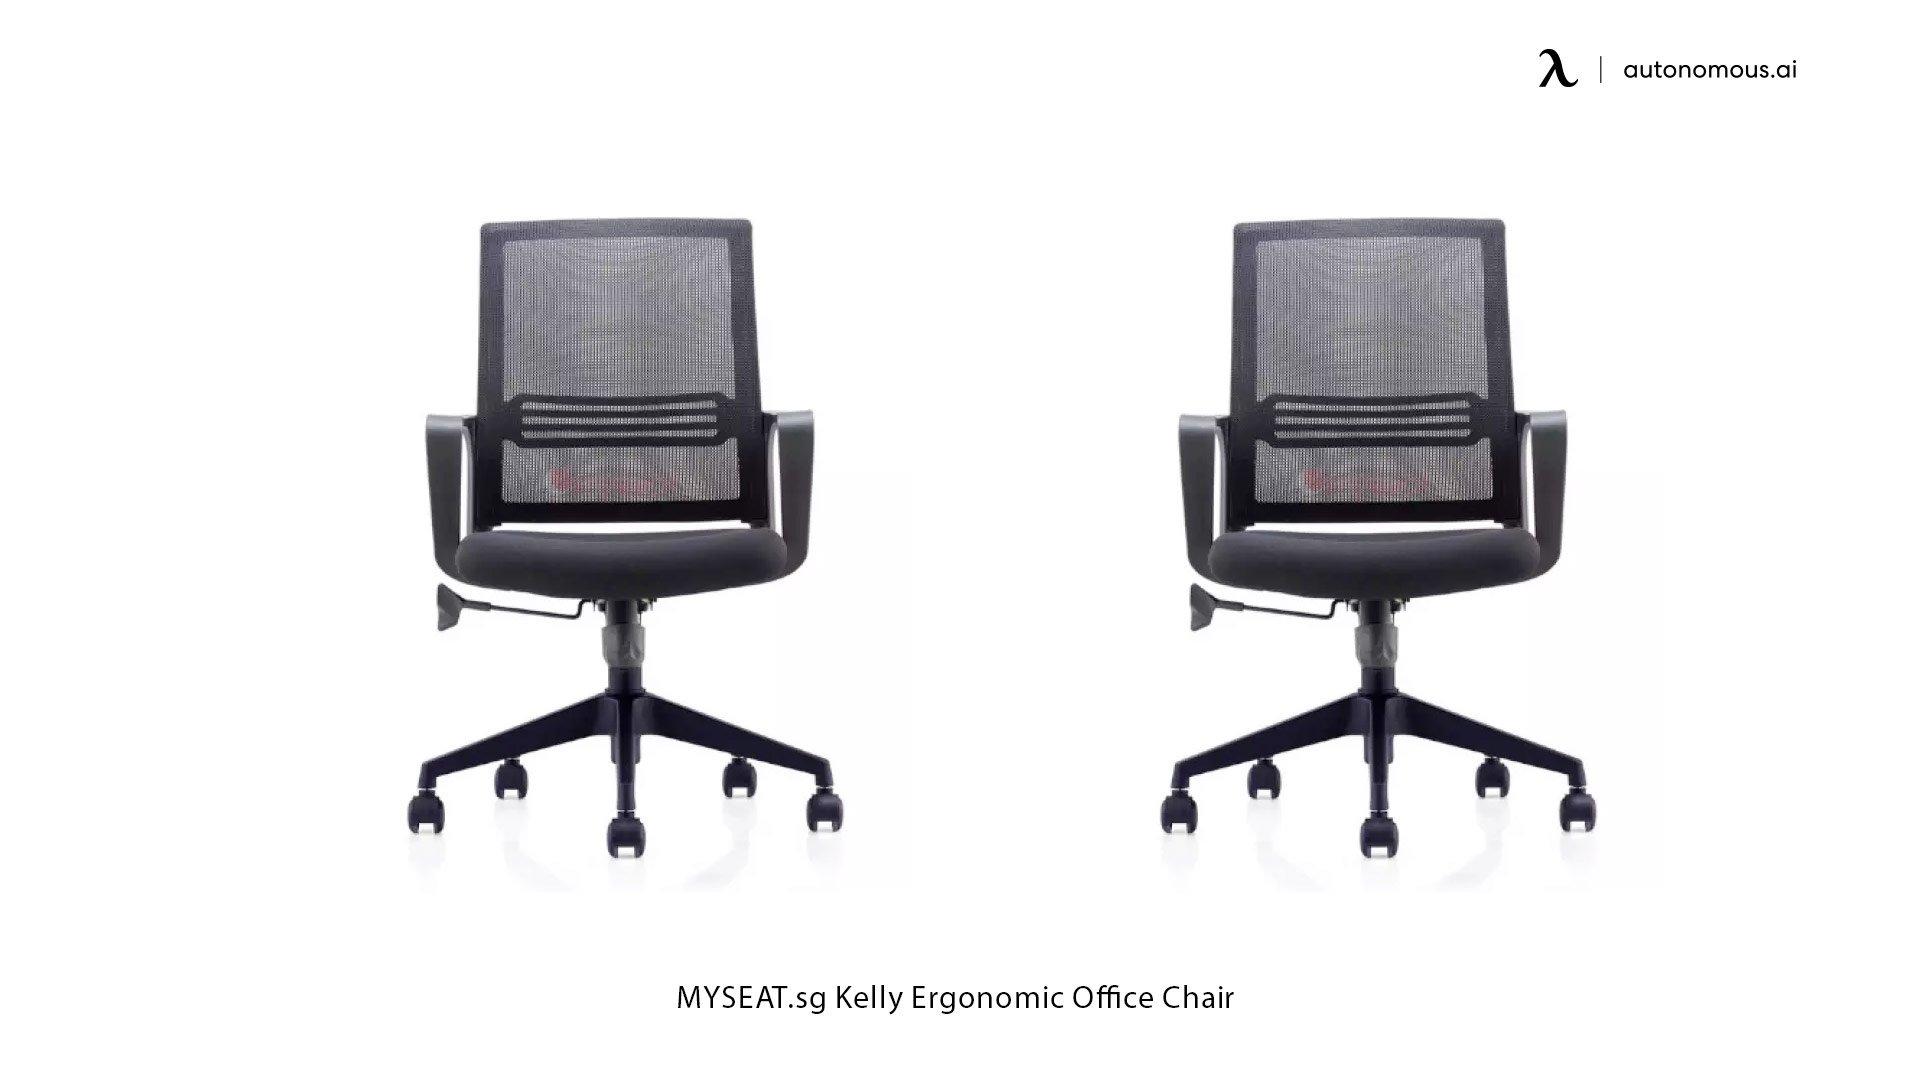 MYSEAT.sg Kelly Ergonomic Office Chair